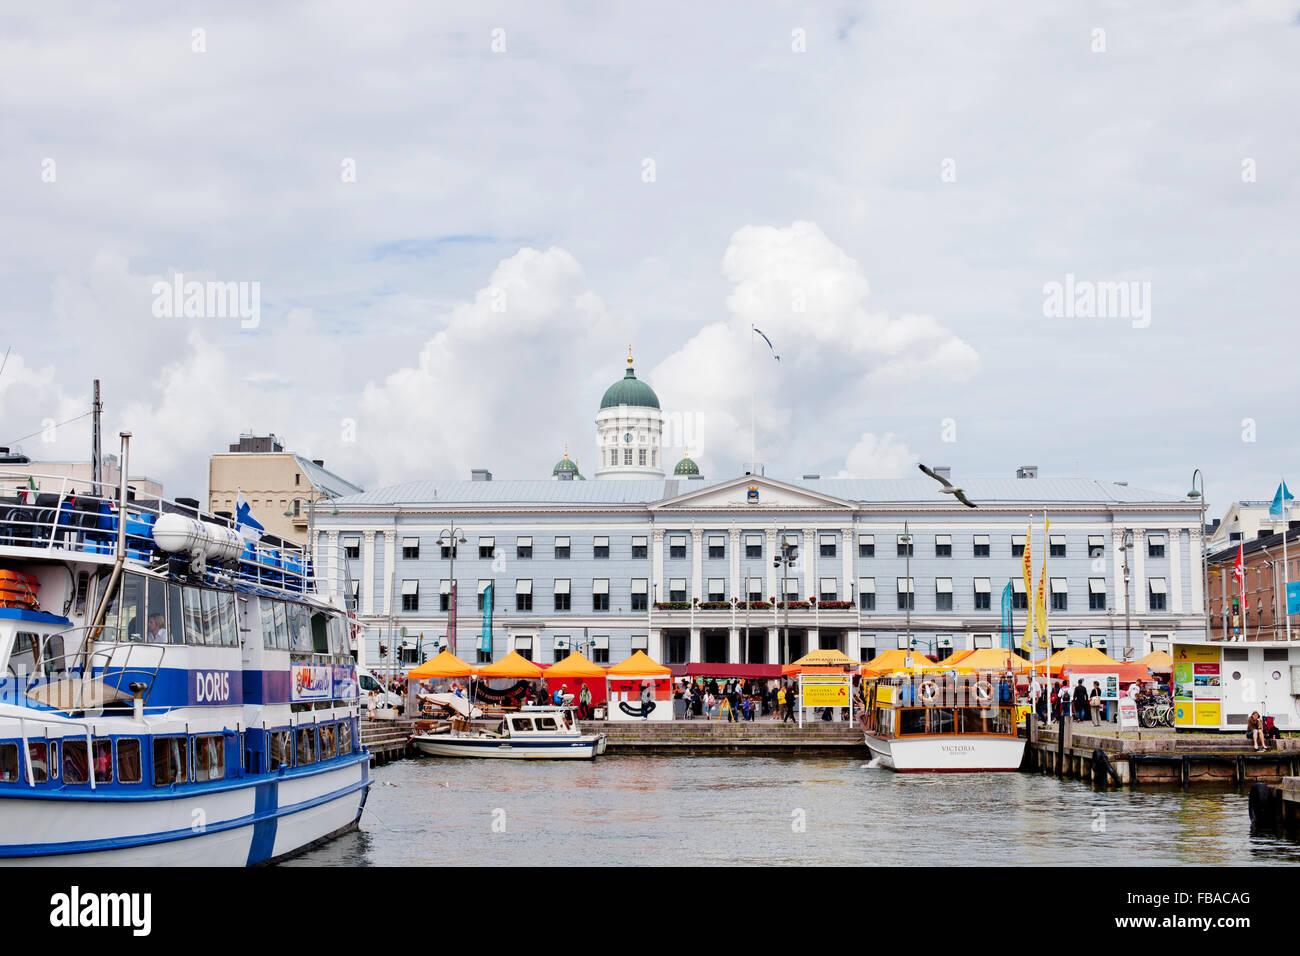 Finland, Uusimaa, Helsinki, Kruunuhaka, View of marina with anchored boats on cloudy day Stock Photo